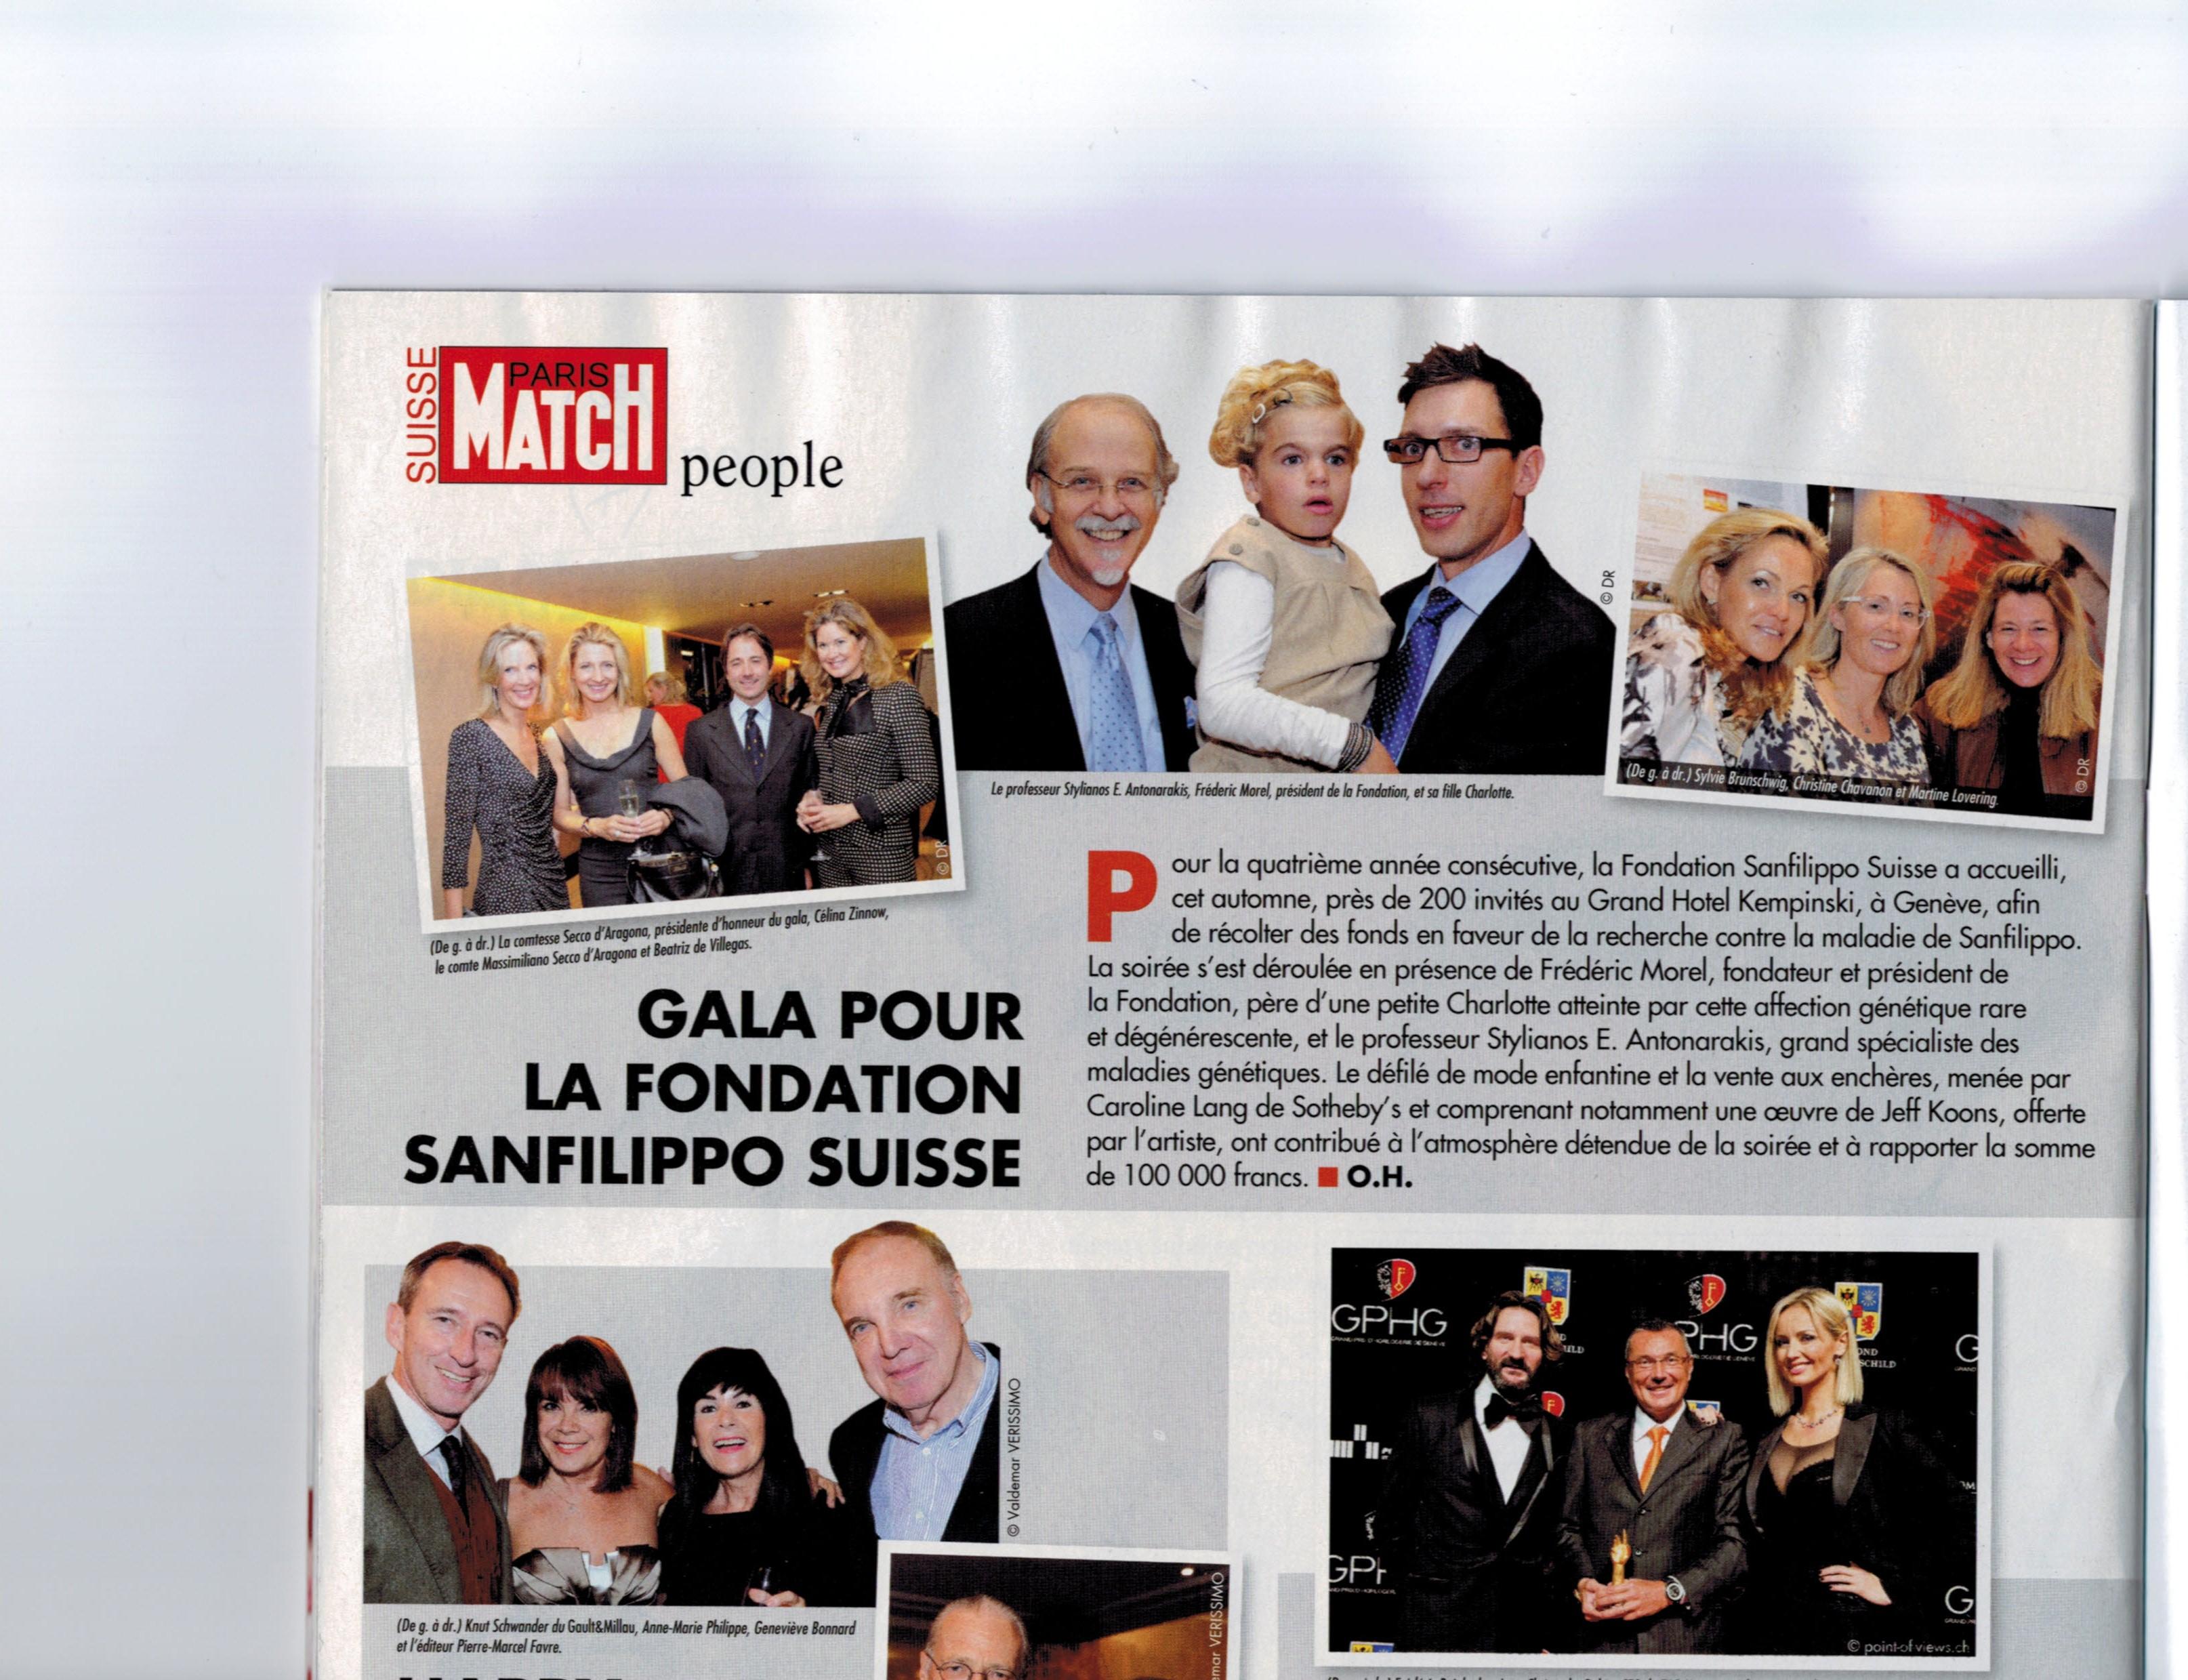 Paris Match - 21.12.2012